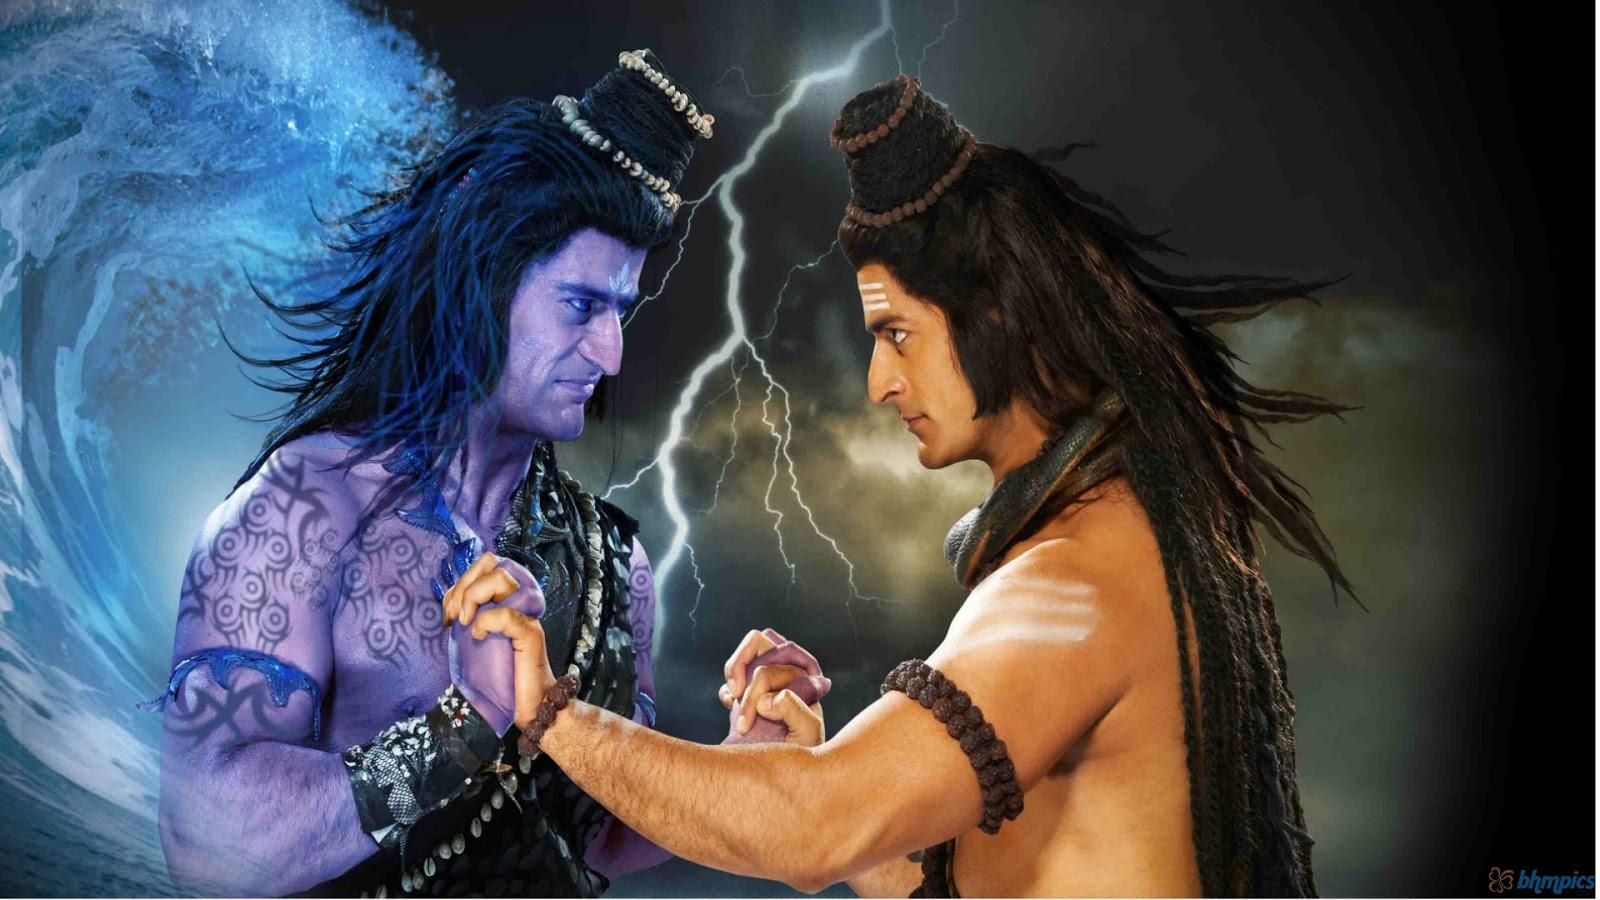 Ghanshyam Maharaj Wallpaper Hd Jay Swaminarayan Wallpapers God Shiva Images God Shiva